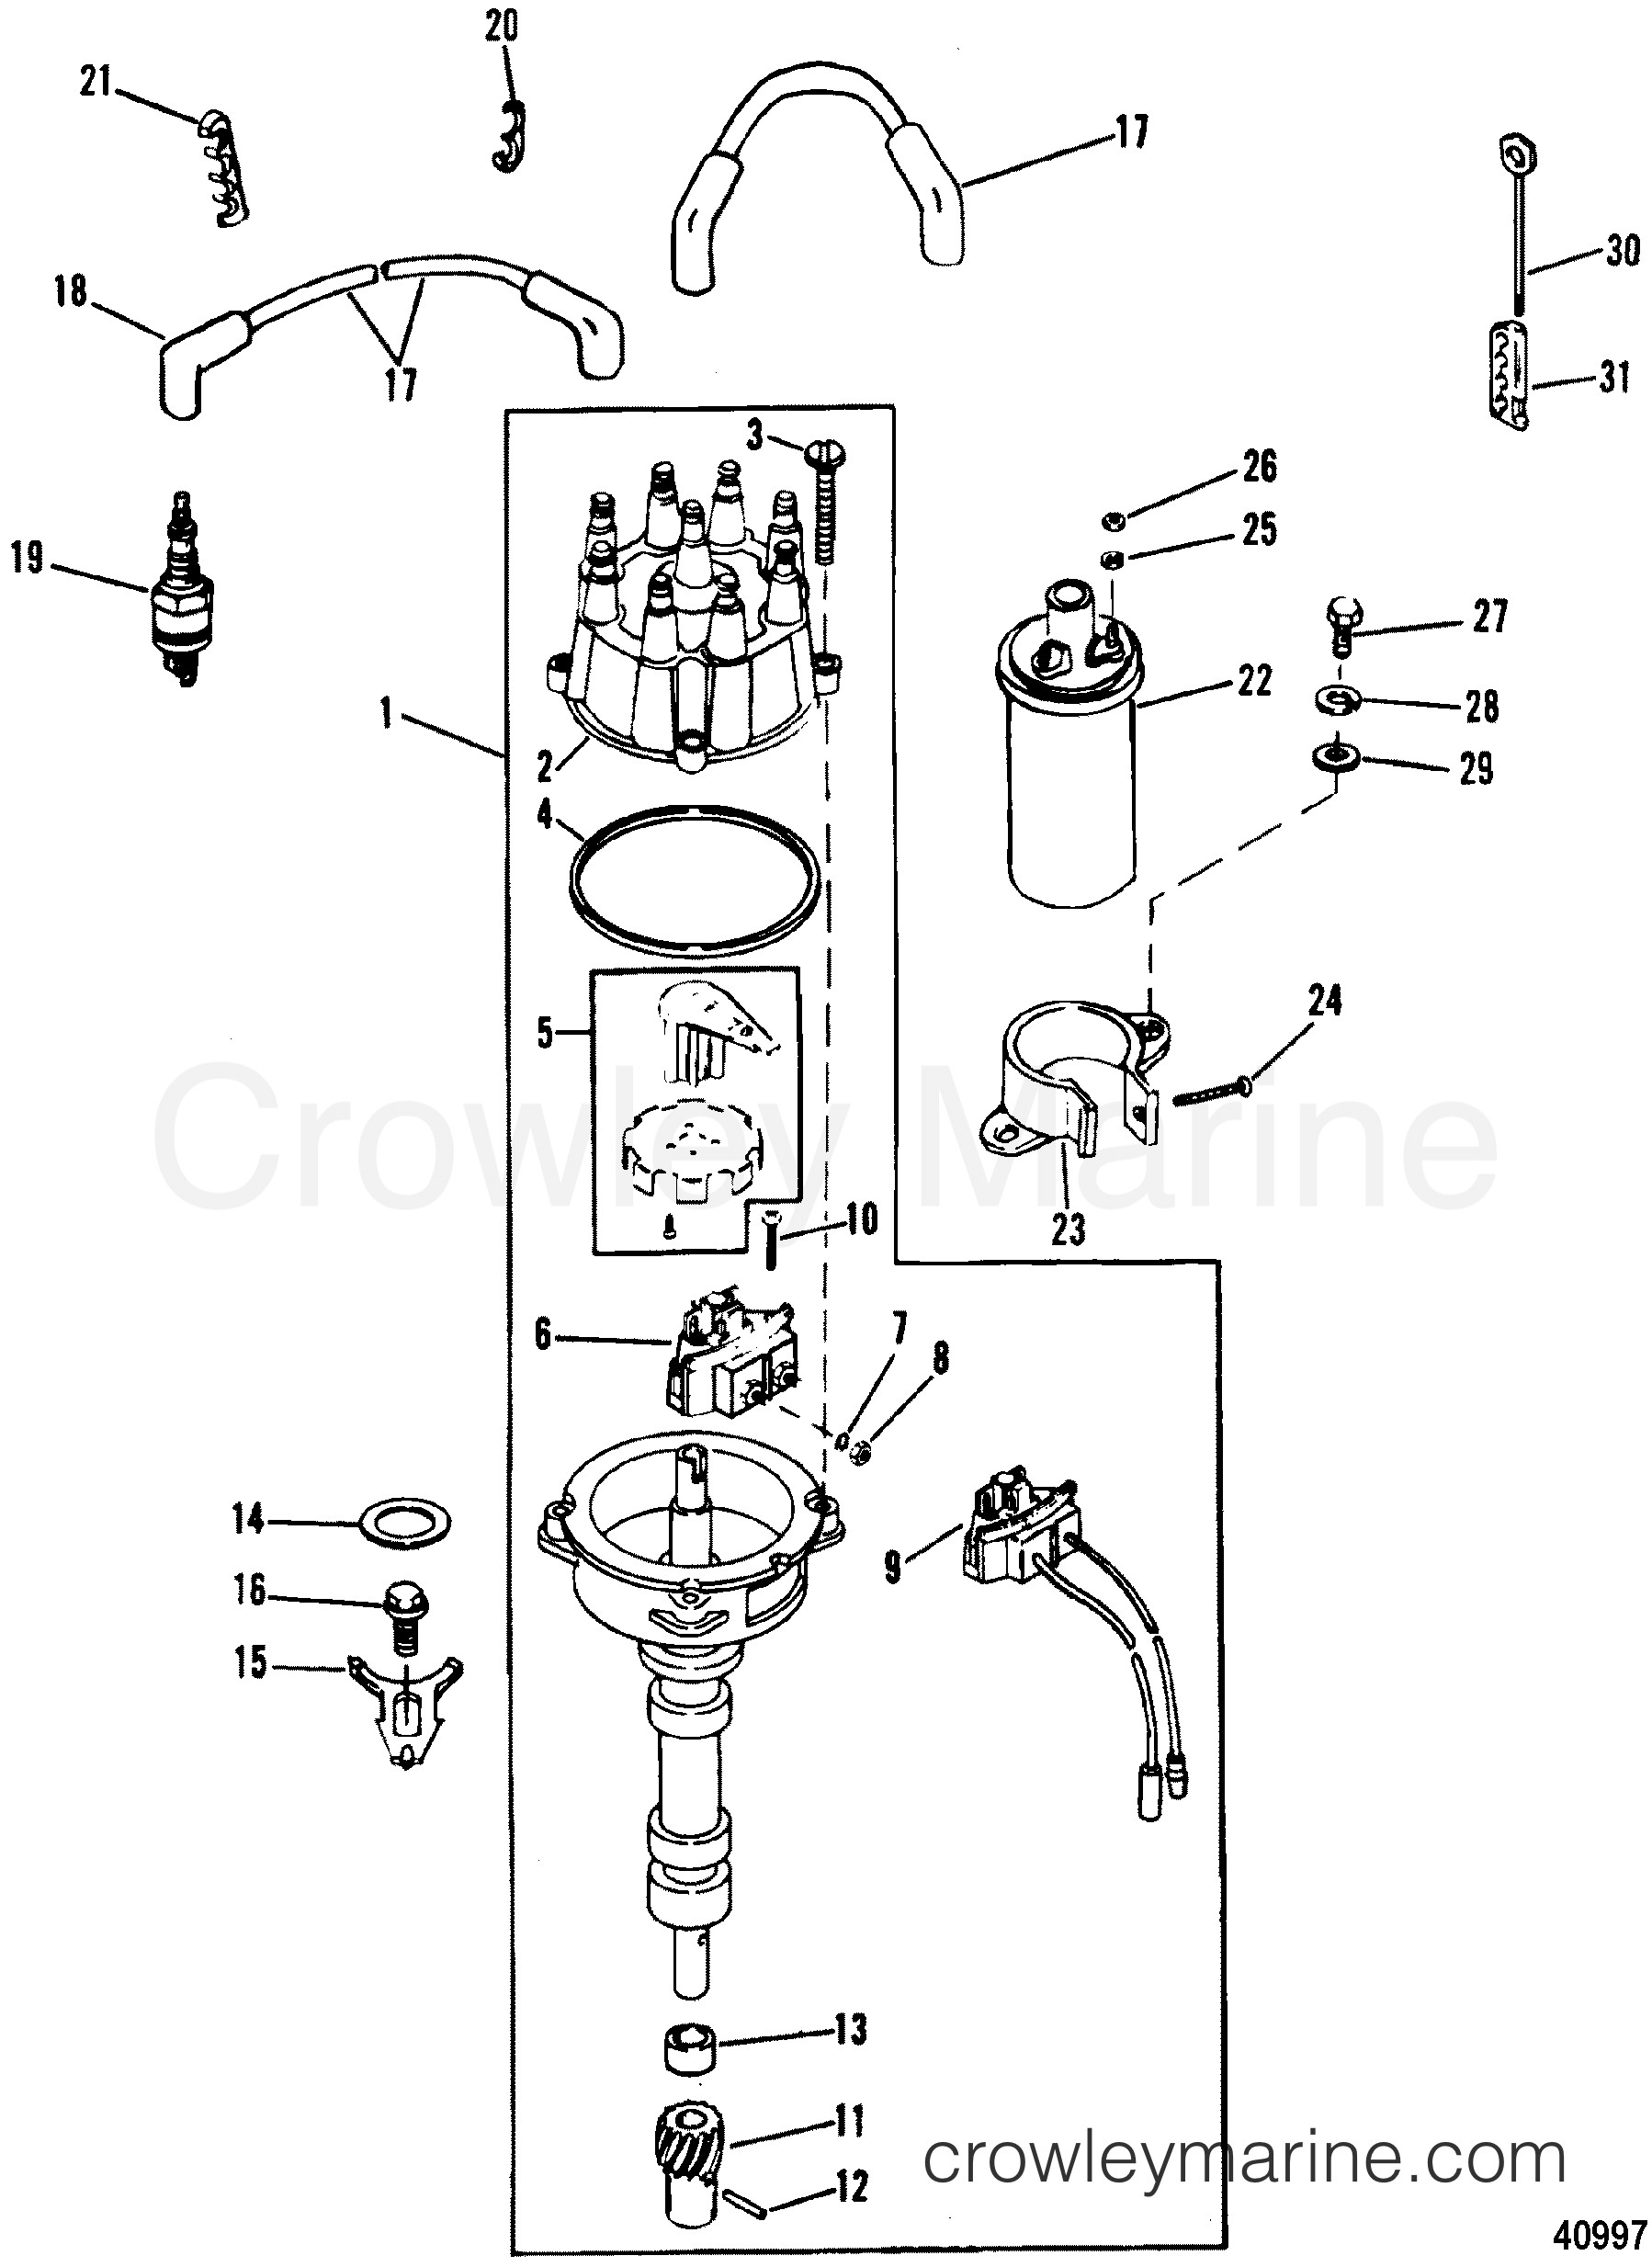 1988 Mercury Inboard Engine 5 7L [SKI] AS DISTRIBUTOR & IGNITION PONENTS